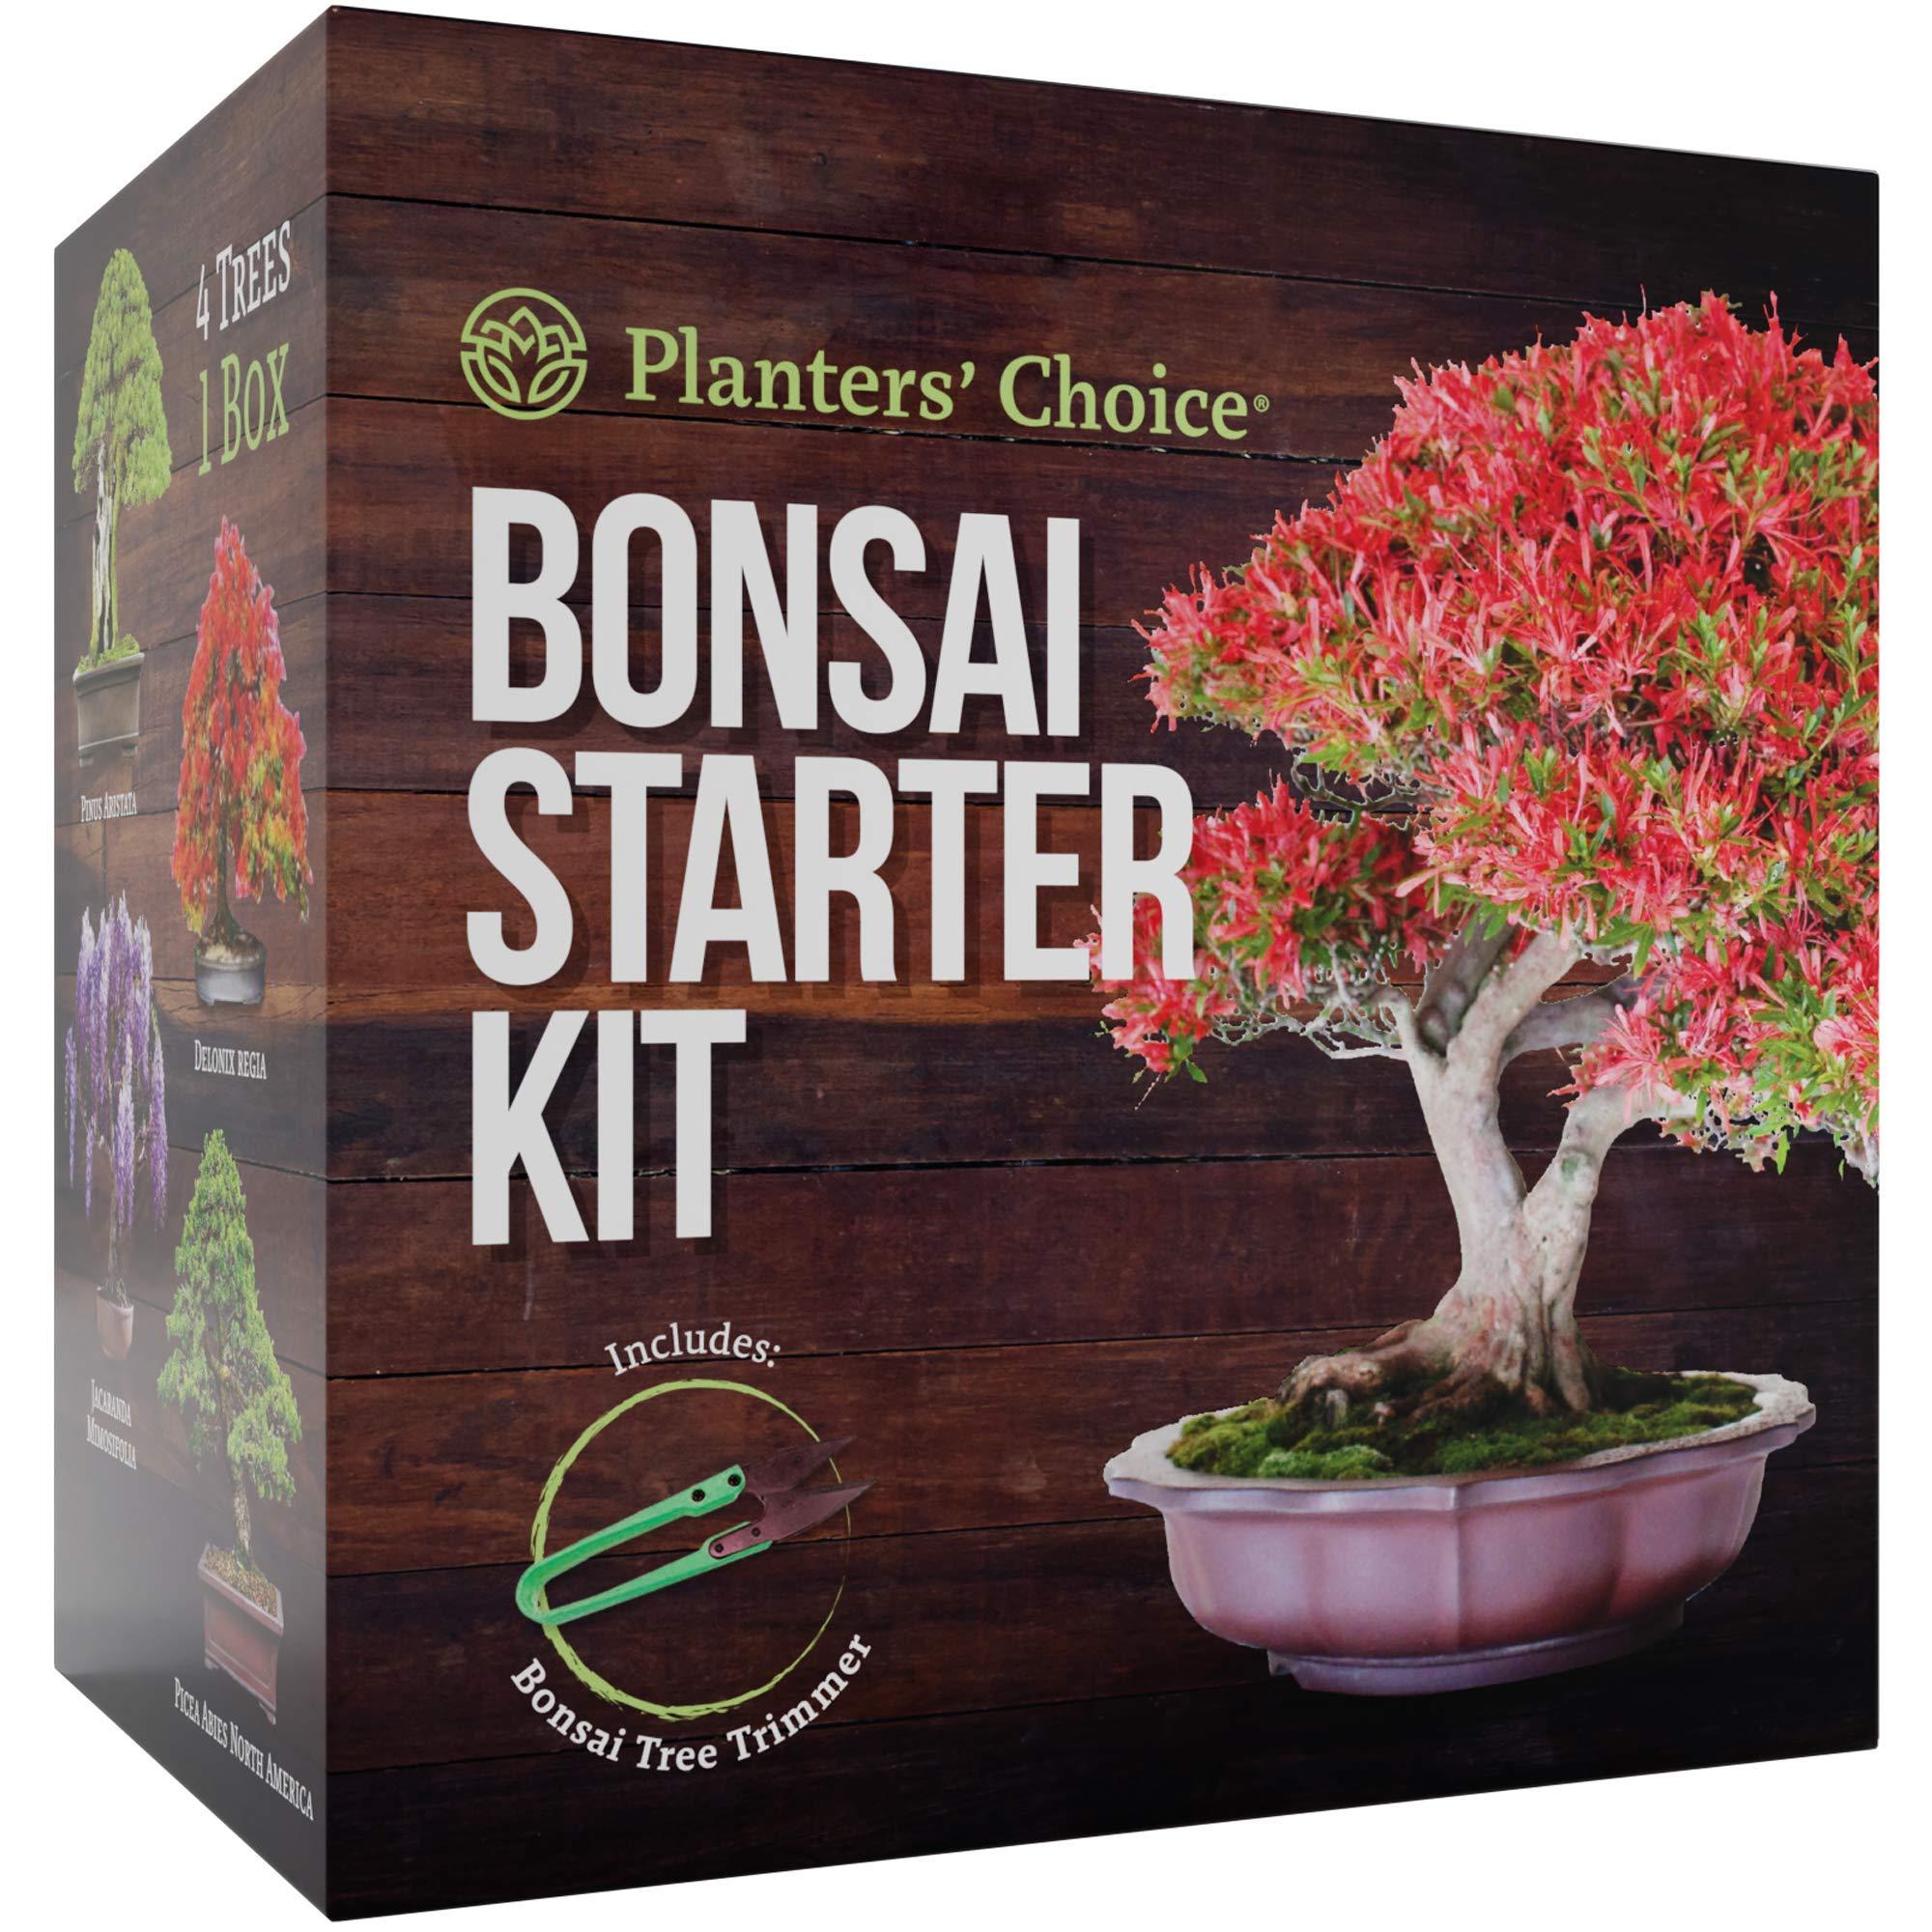 Bonsai Starter Kit The Complete Growing Kit